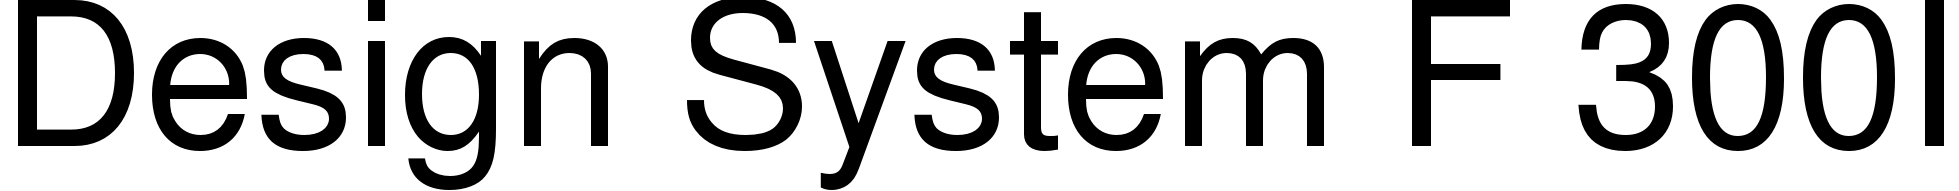 Design System F 300I